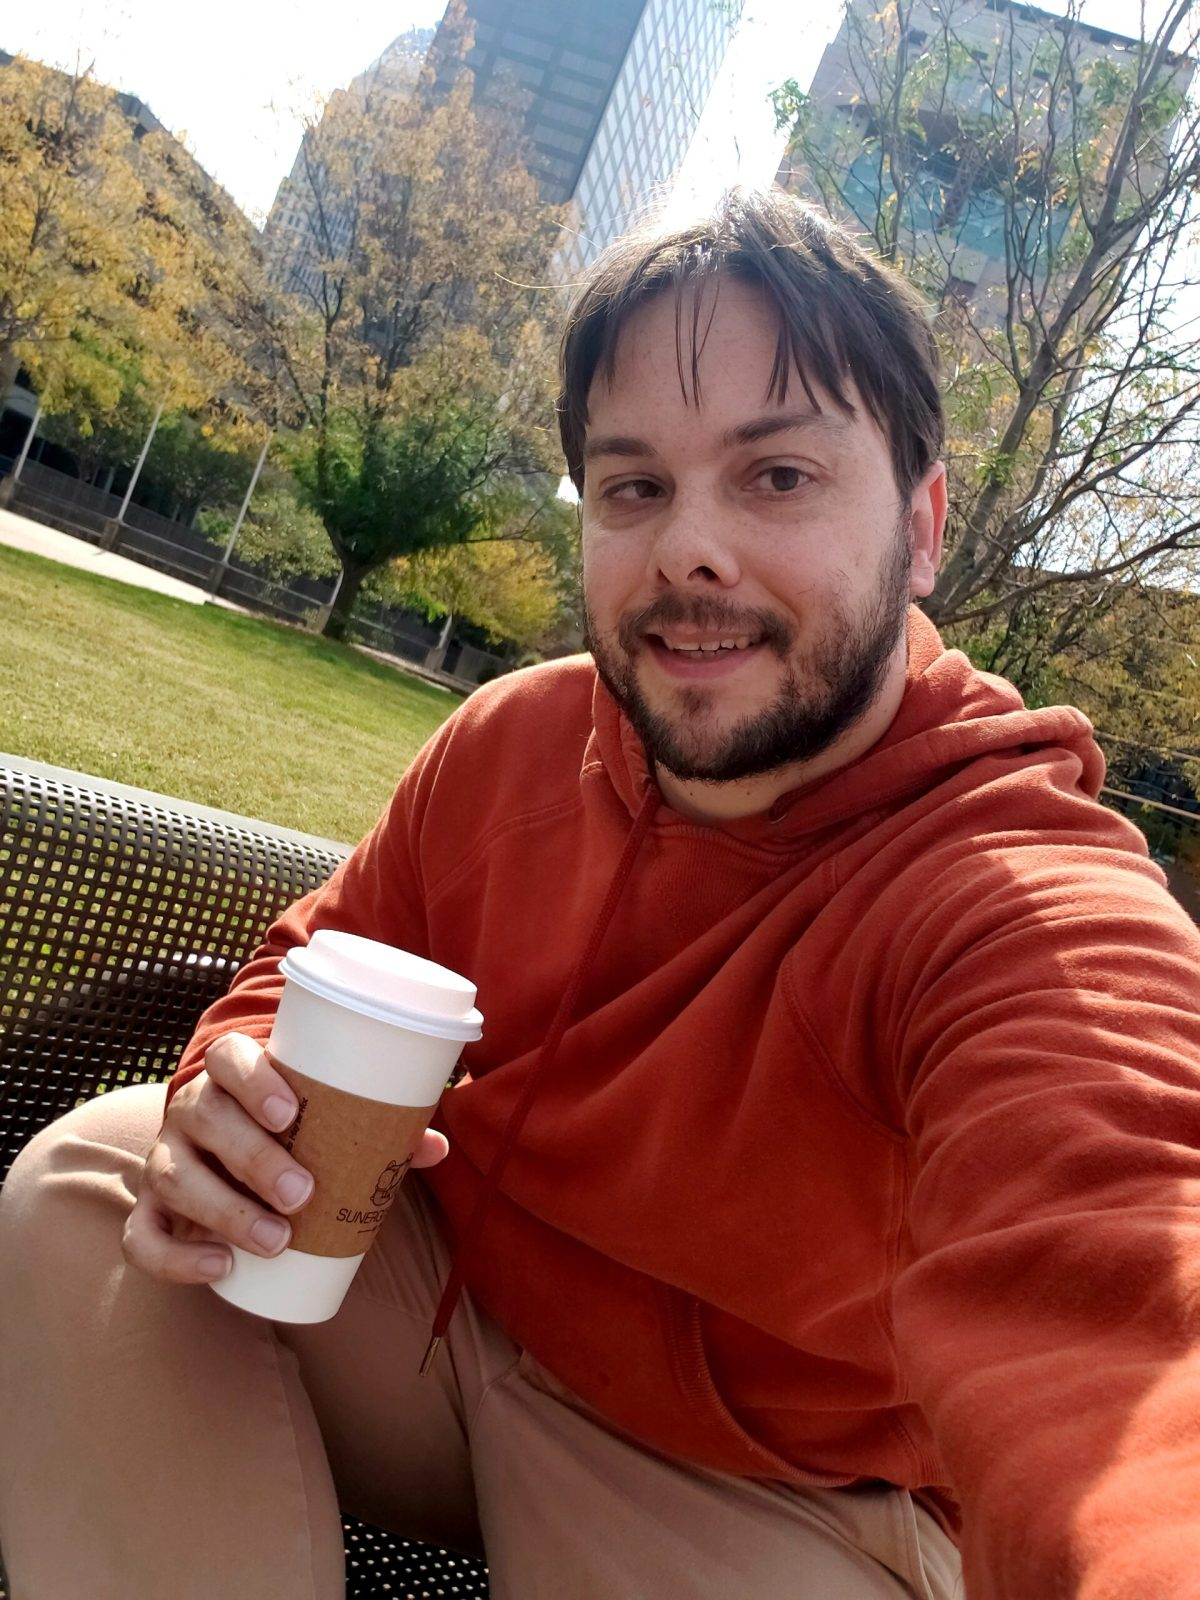 Eric Shay Howard selfie with coffee